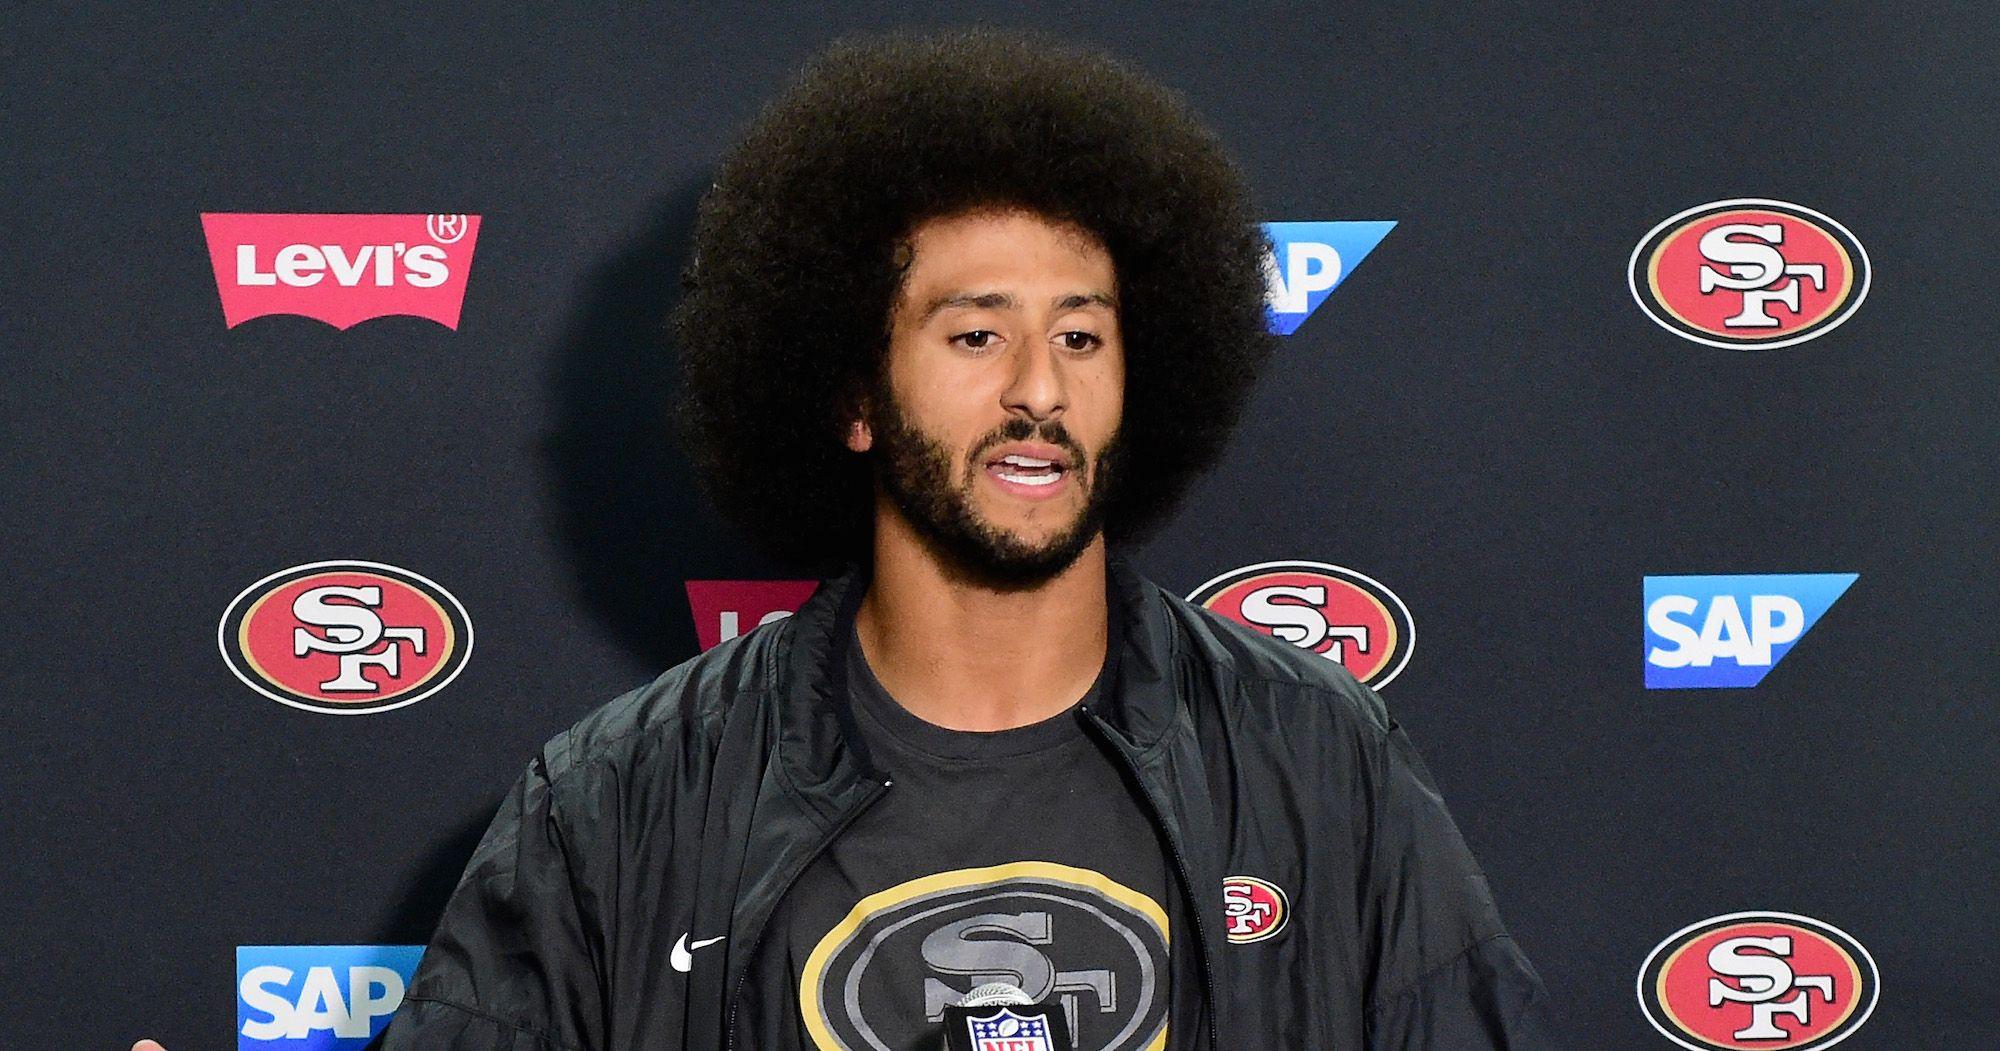 Brandon Marshall Joins Colin Kaepernick National Anthem Protest